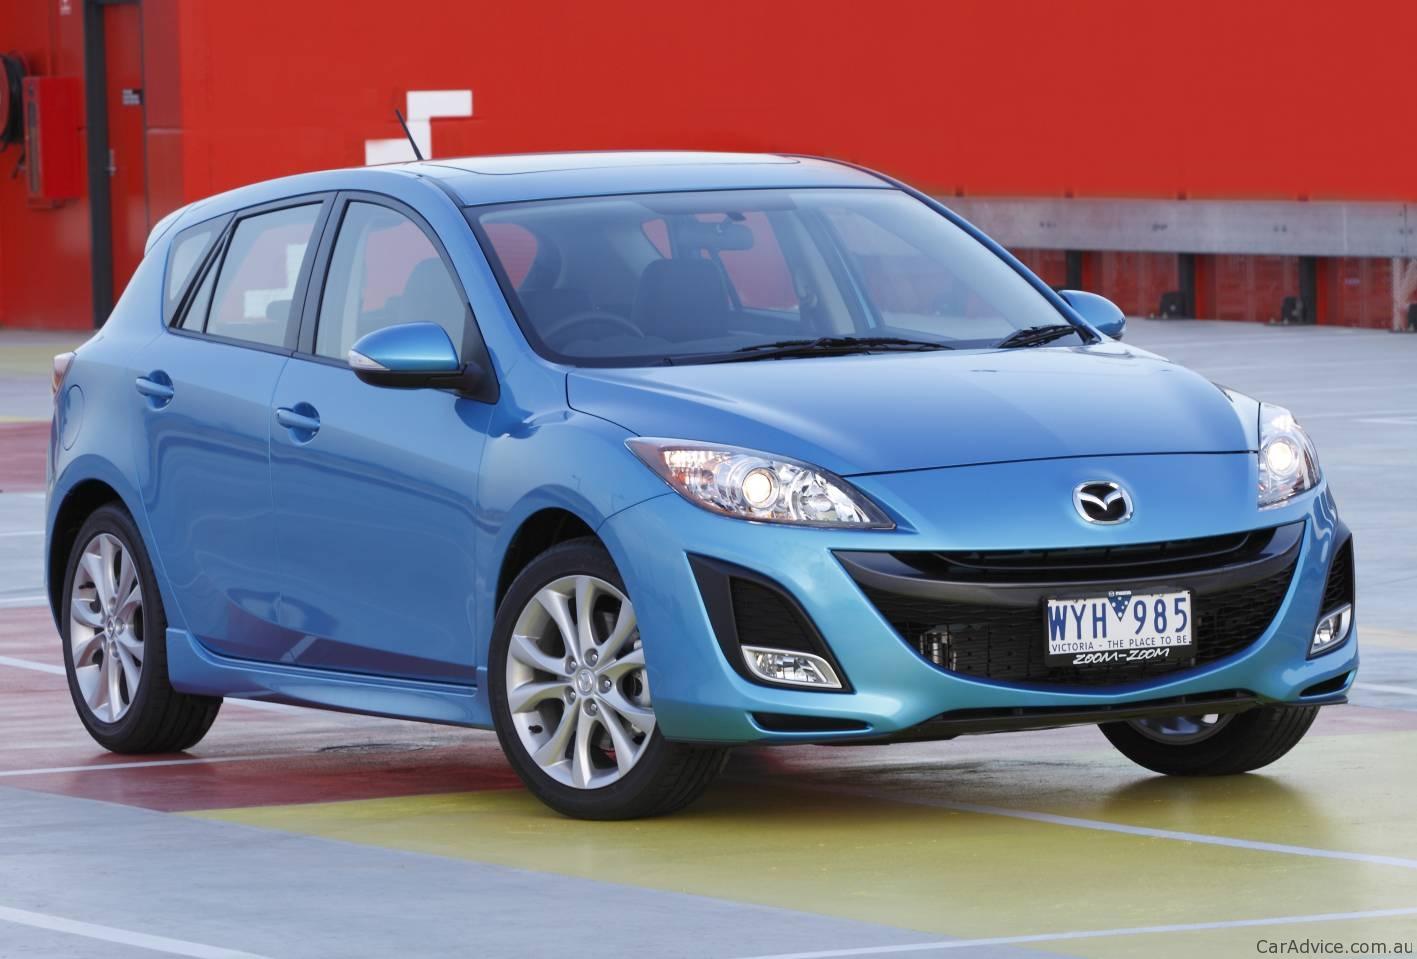 100 Mazda 2009 2009 Mazda 3 2 0 Related Infomation Specifications Weili B5793 2009 Mazda